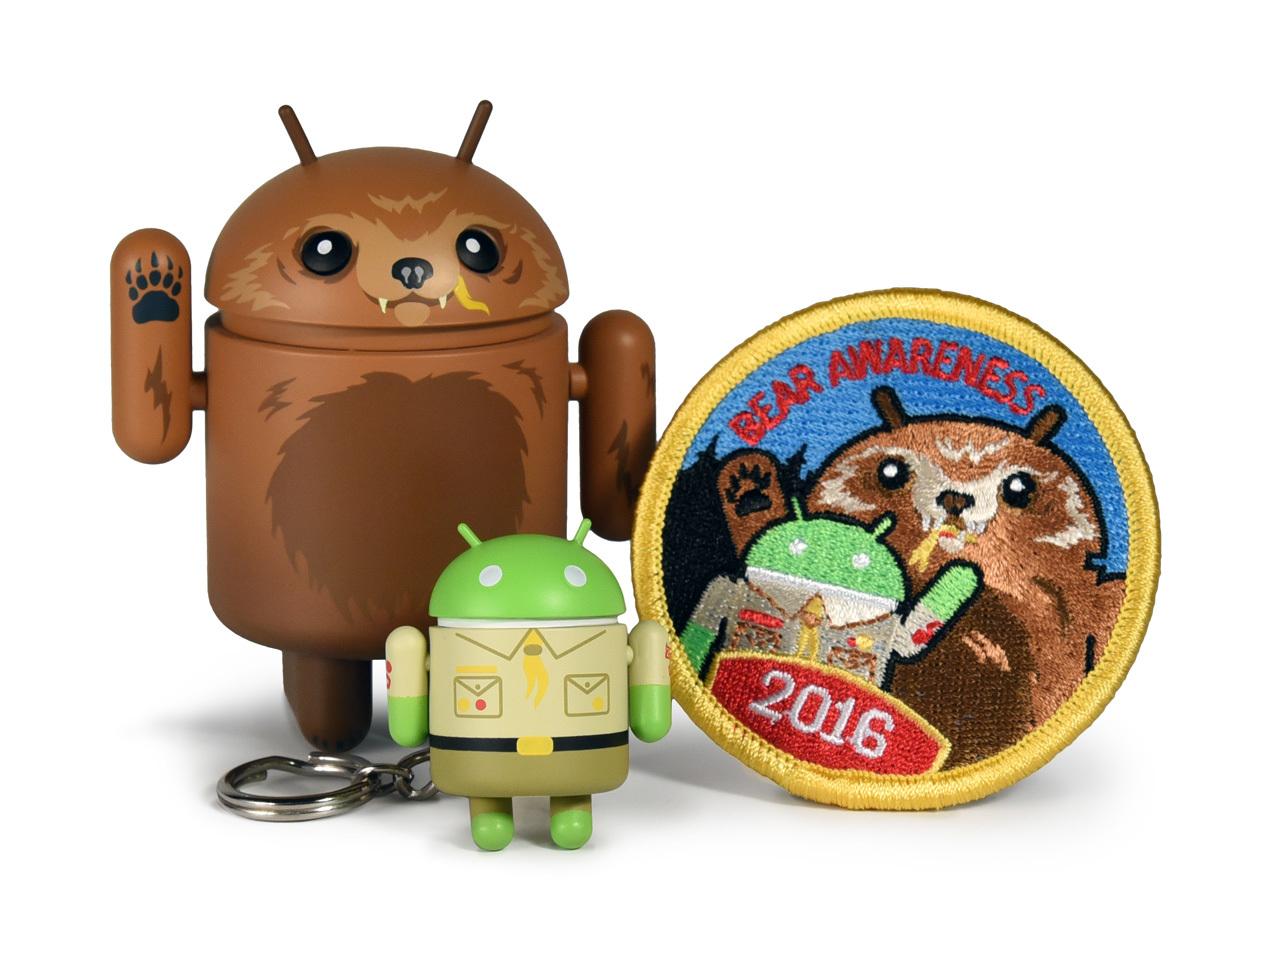 android-summer2016-bearaware-1280__94194-1467918937-1280-1280